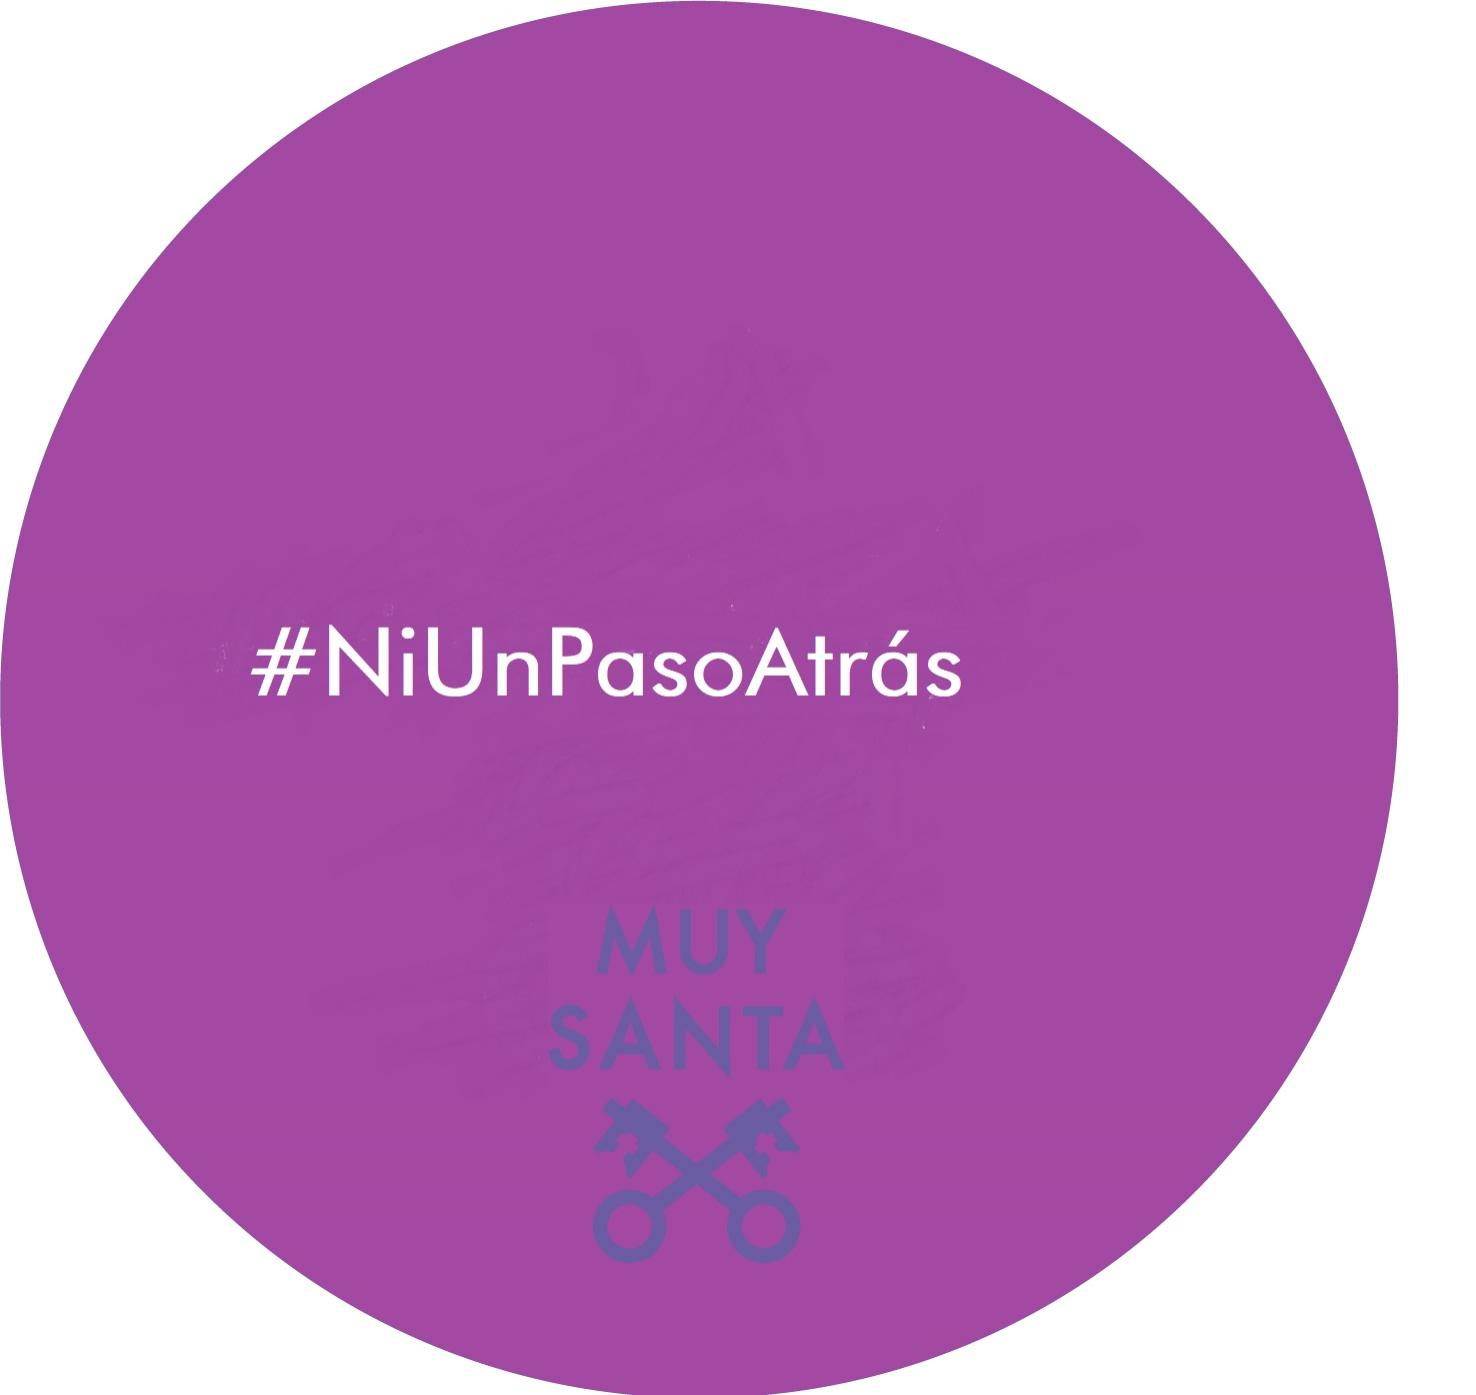 Chapa #NiUnPasoAtrás